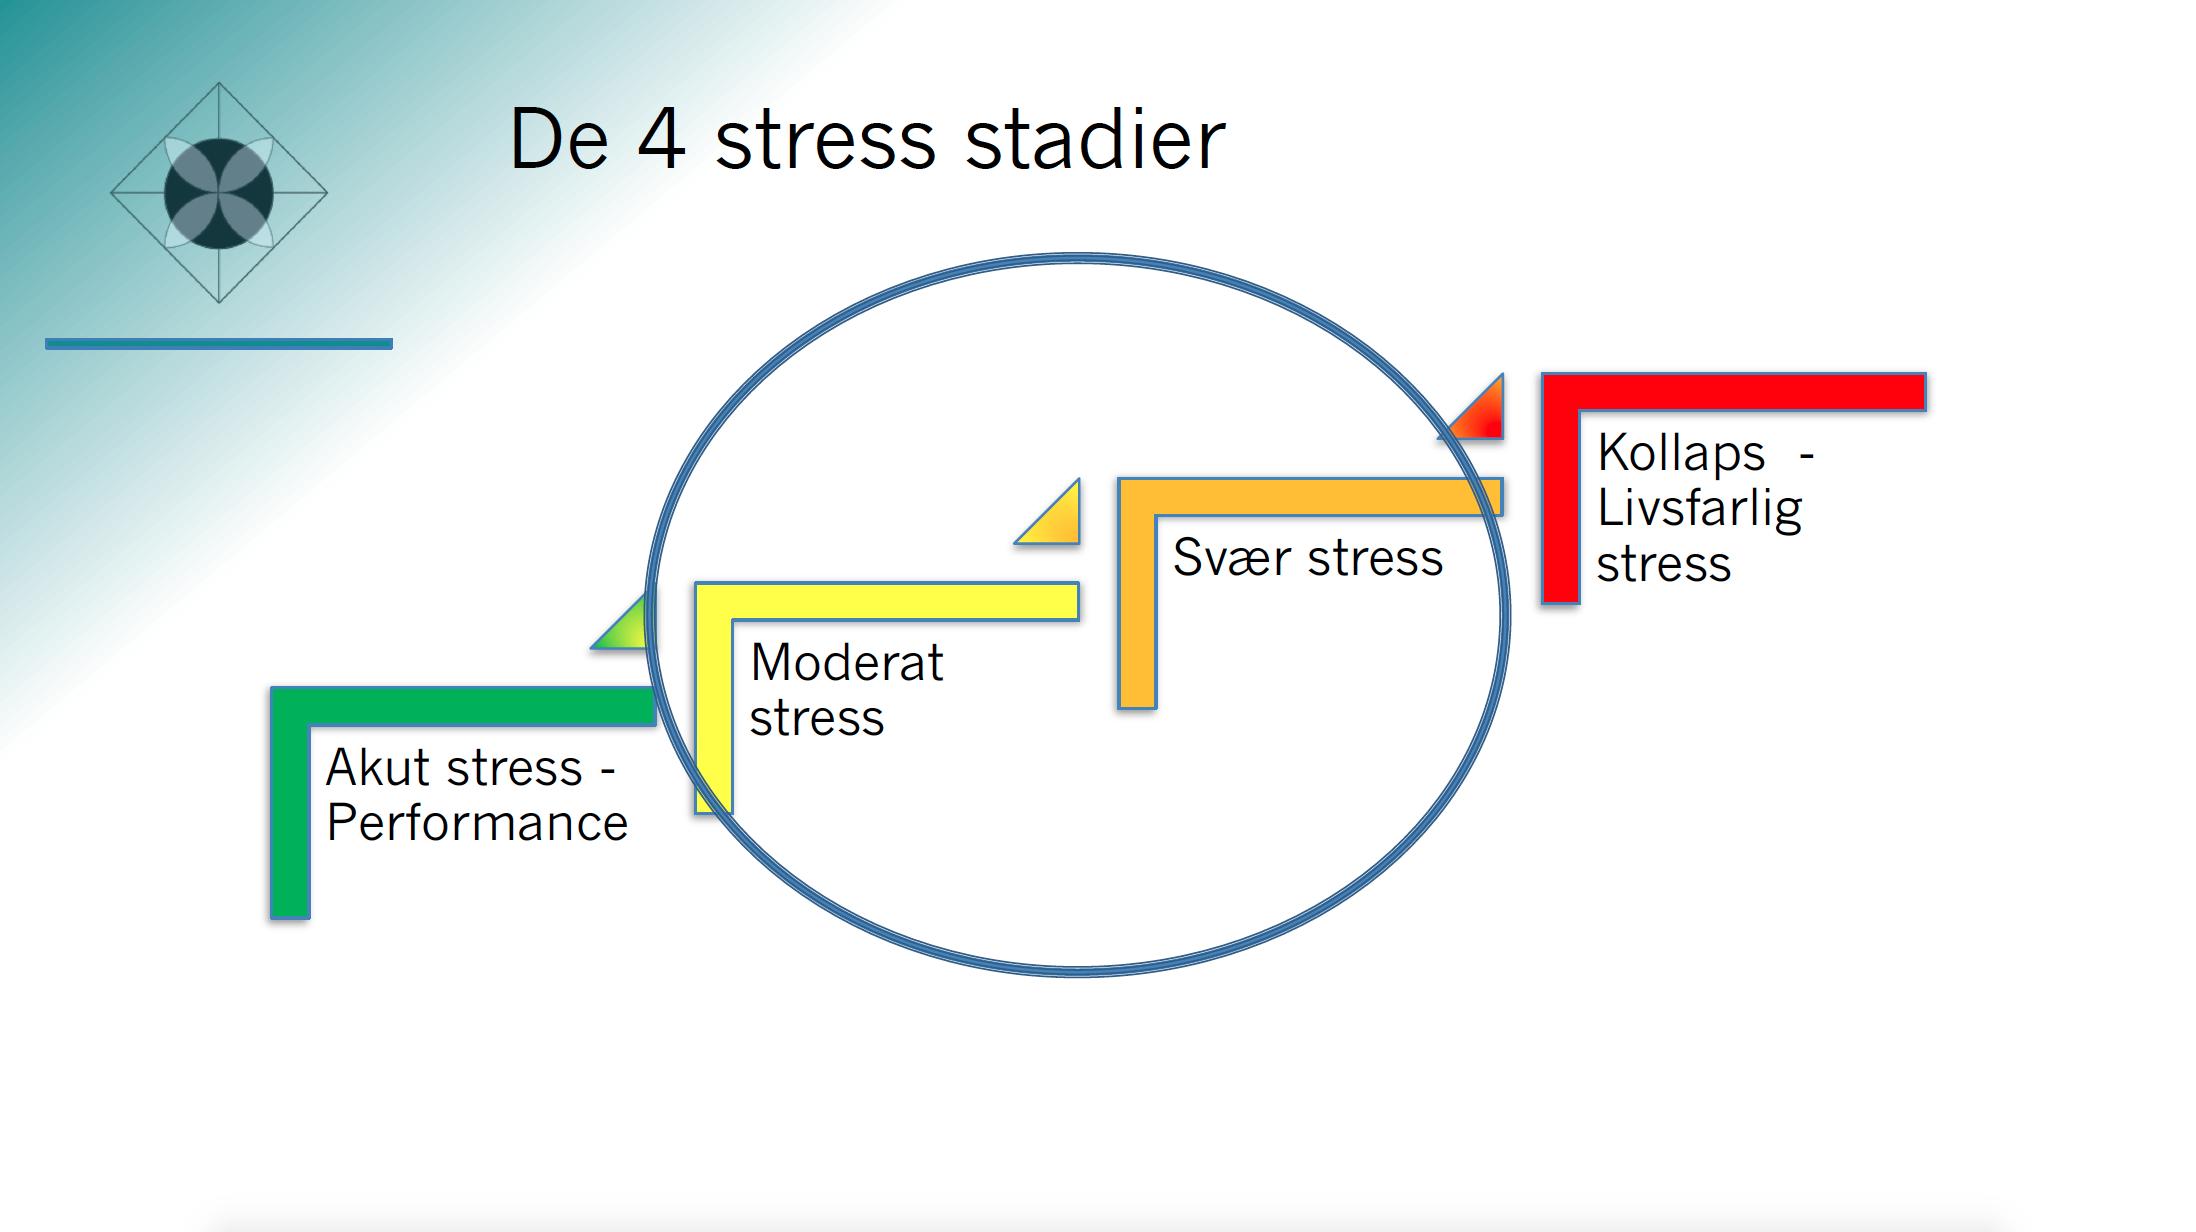 Bliv stressfri med De 4 Stress-stadier